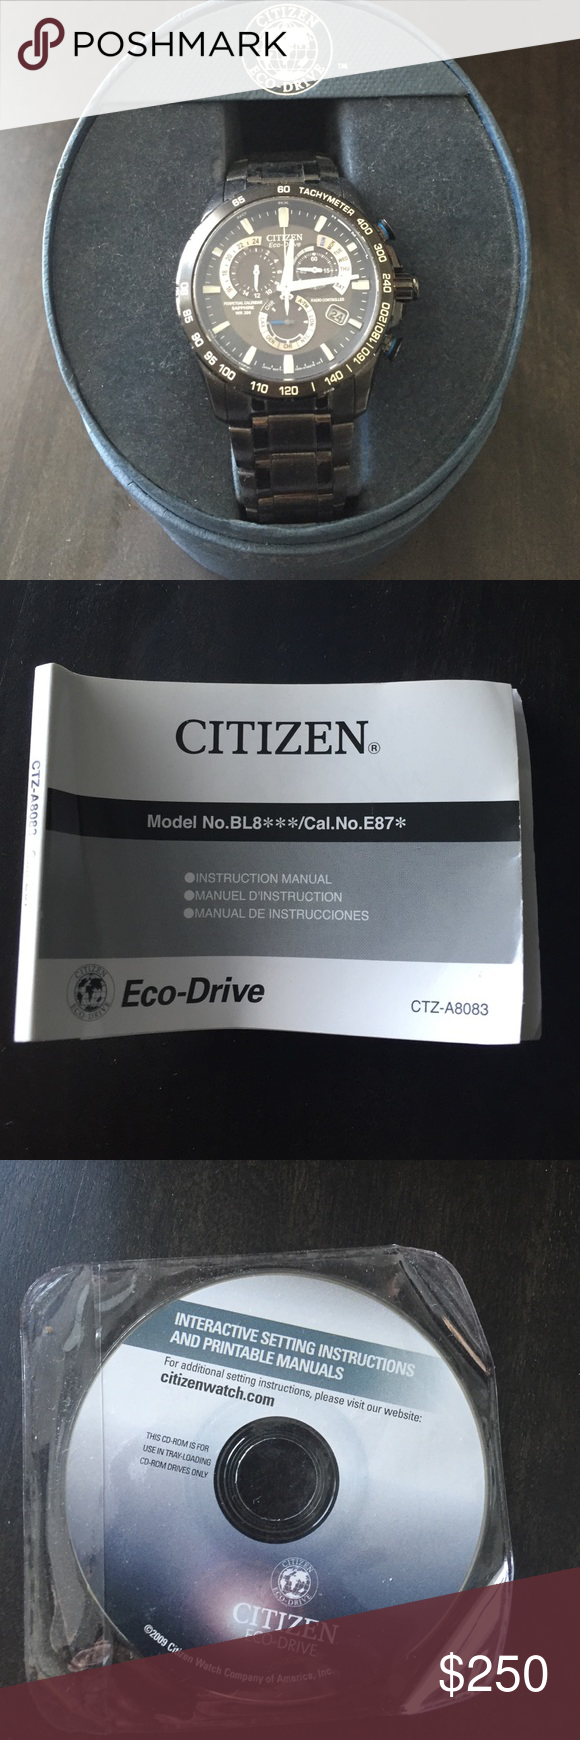 citizen eco drive watch my posh closet pinterest citizen eco rh pinterest com Citizen Dive Watch Citizen Eco-Drive Watches Manual